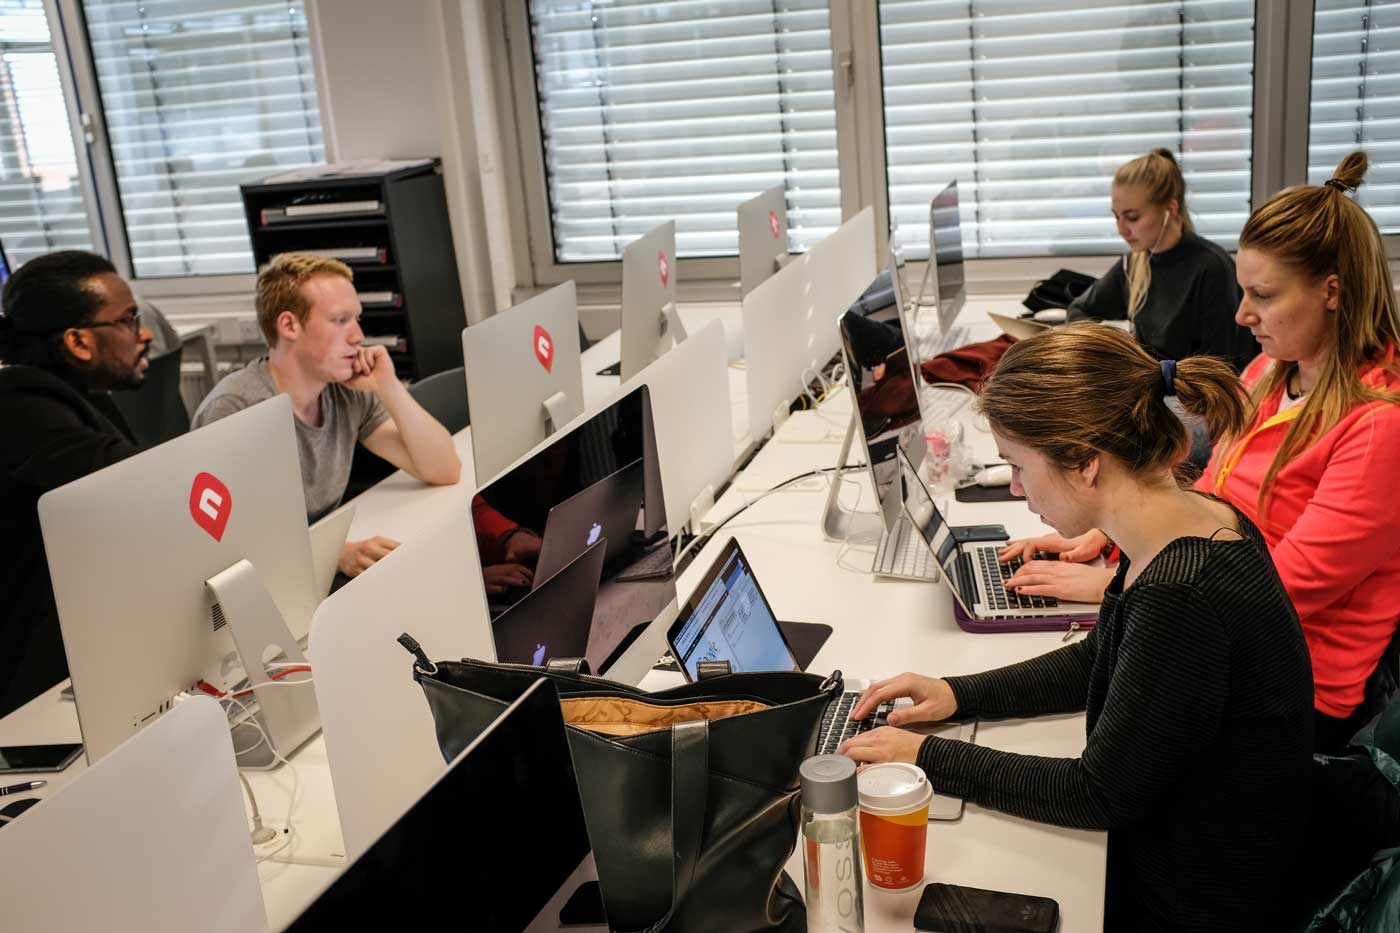 Digital markedsføring utdanning Oslo